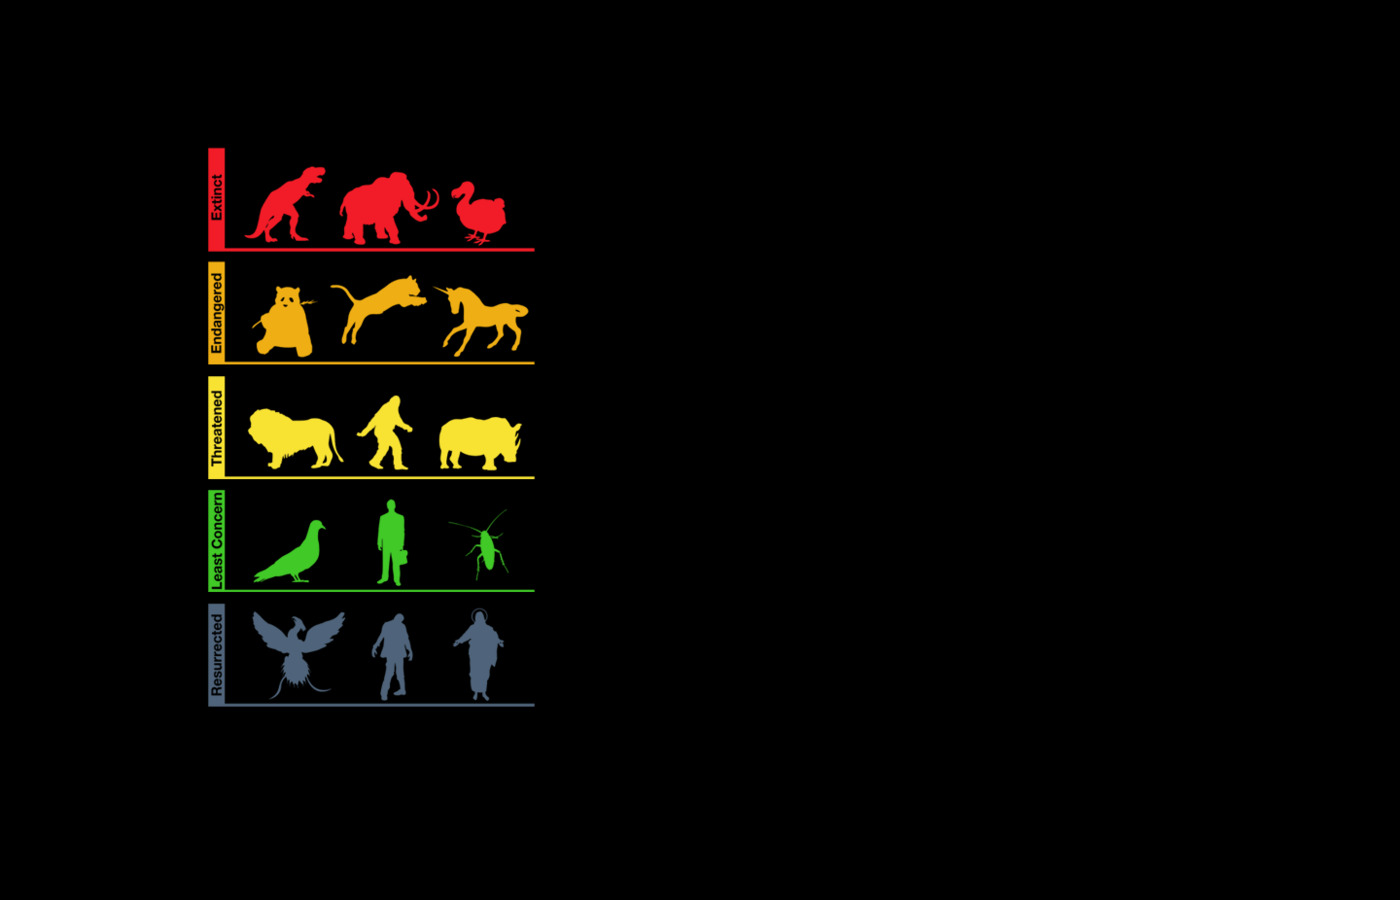 life-evolution-minimalism-pic.jpg